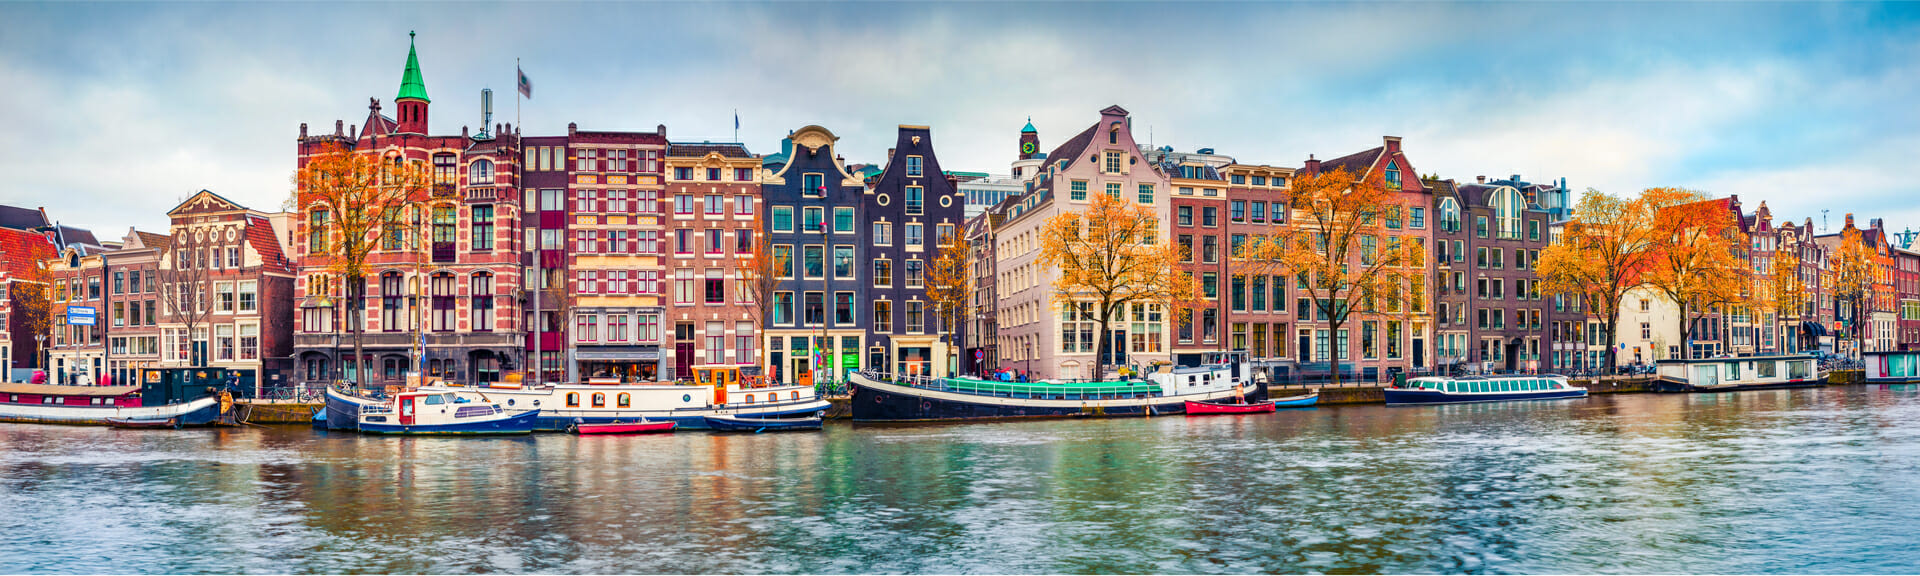 Klassenfahrt Amsterdam Gracht